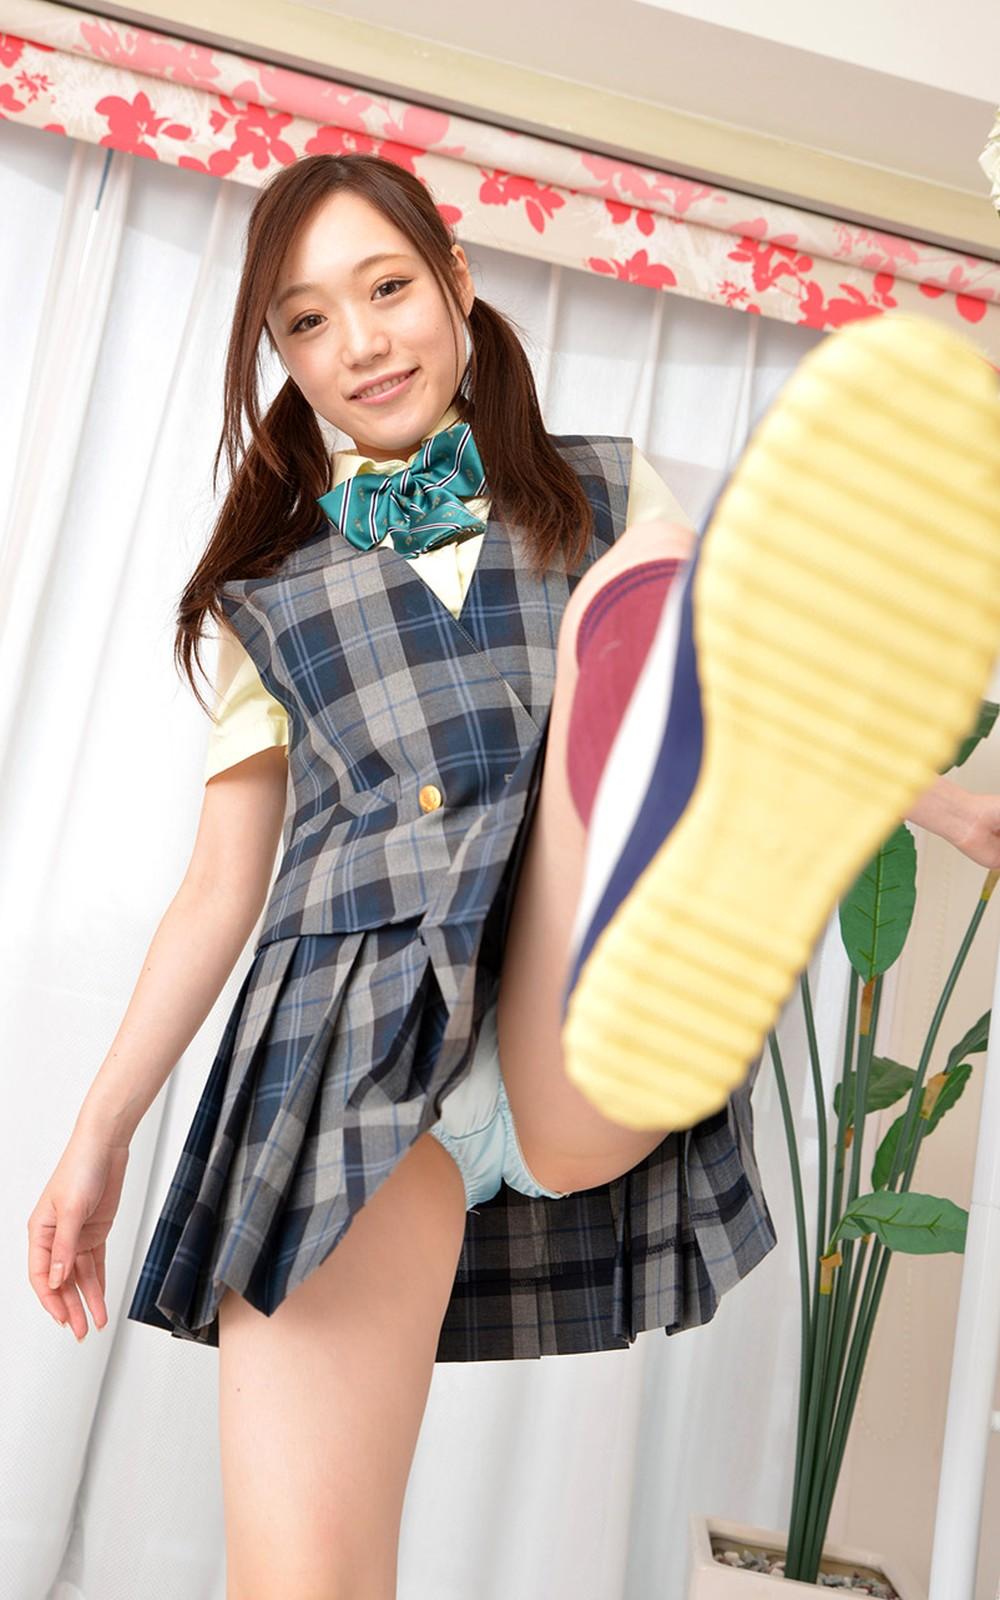 JKパンチラ!女子高生の制服姿のエロ画像32枚・40枚目の画像